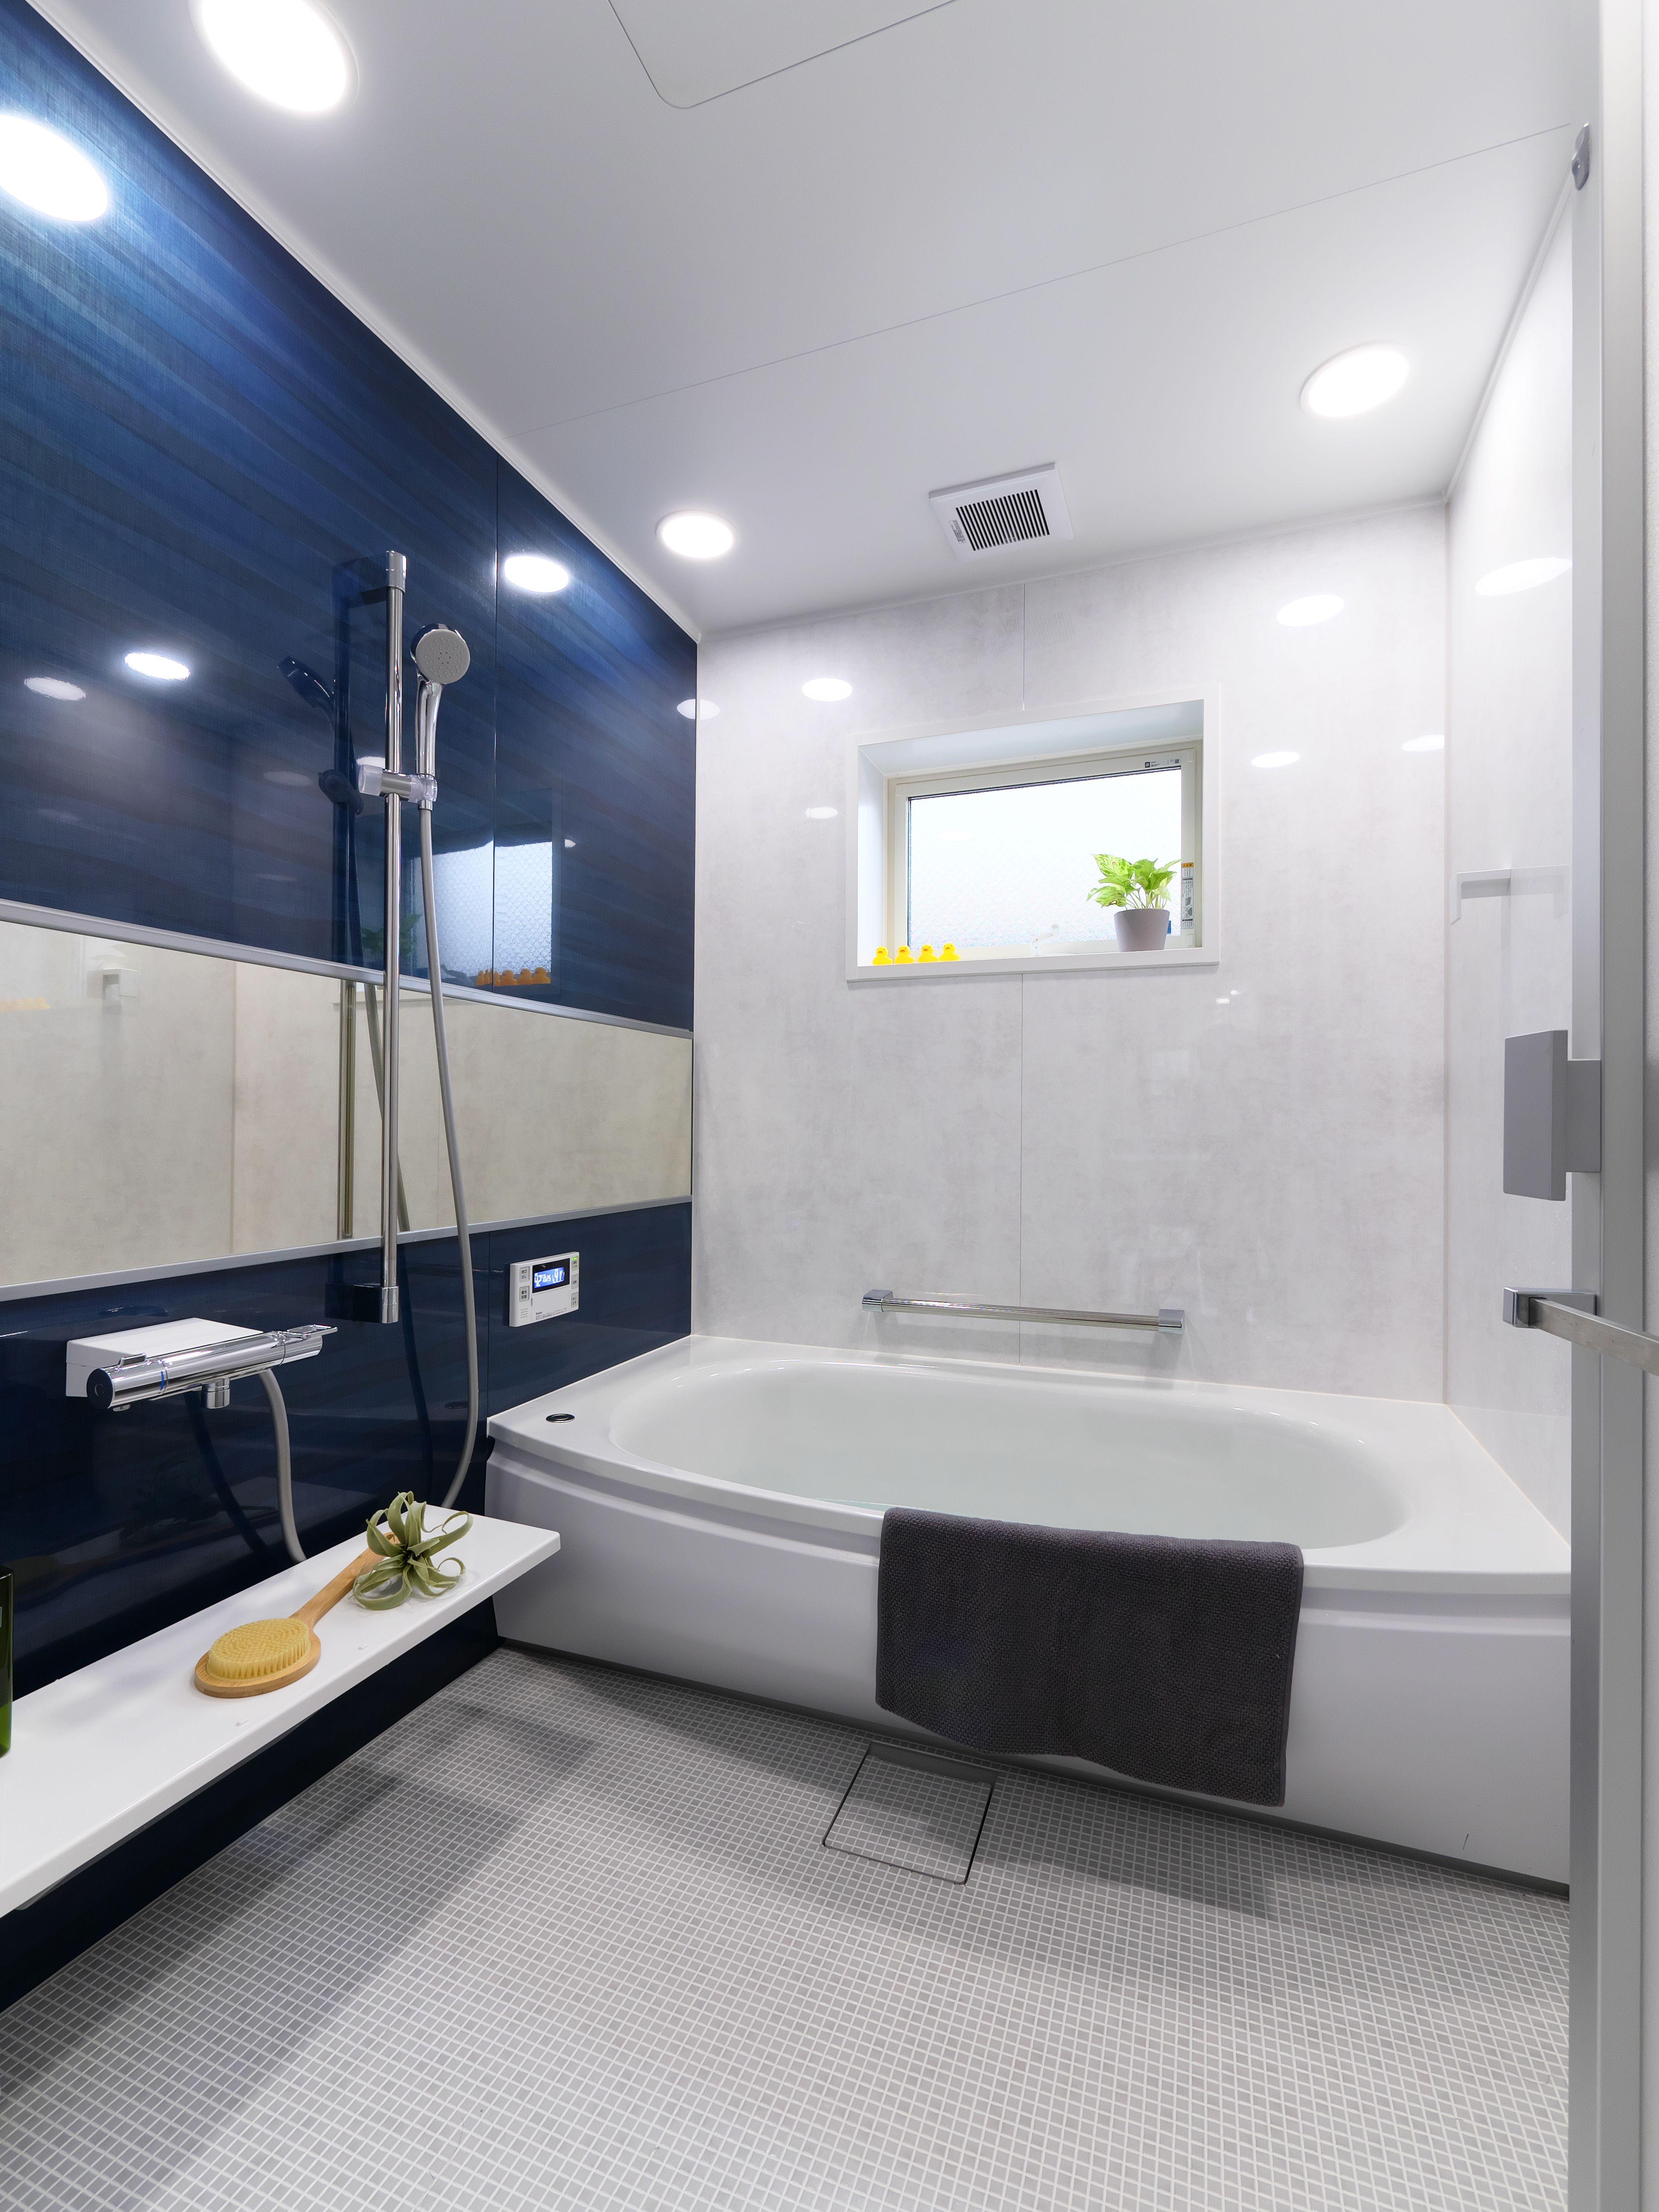 Toto ユニットバス ユニットバス お風呂 インテリア 浴室 デザイン